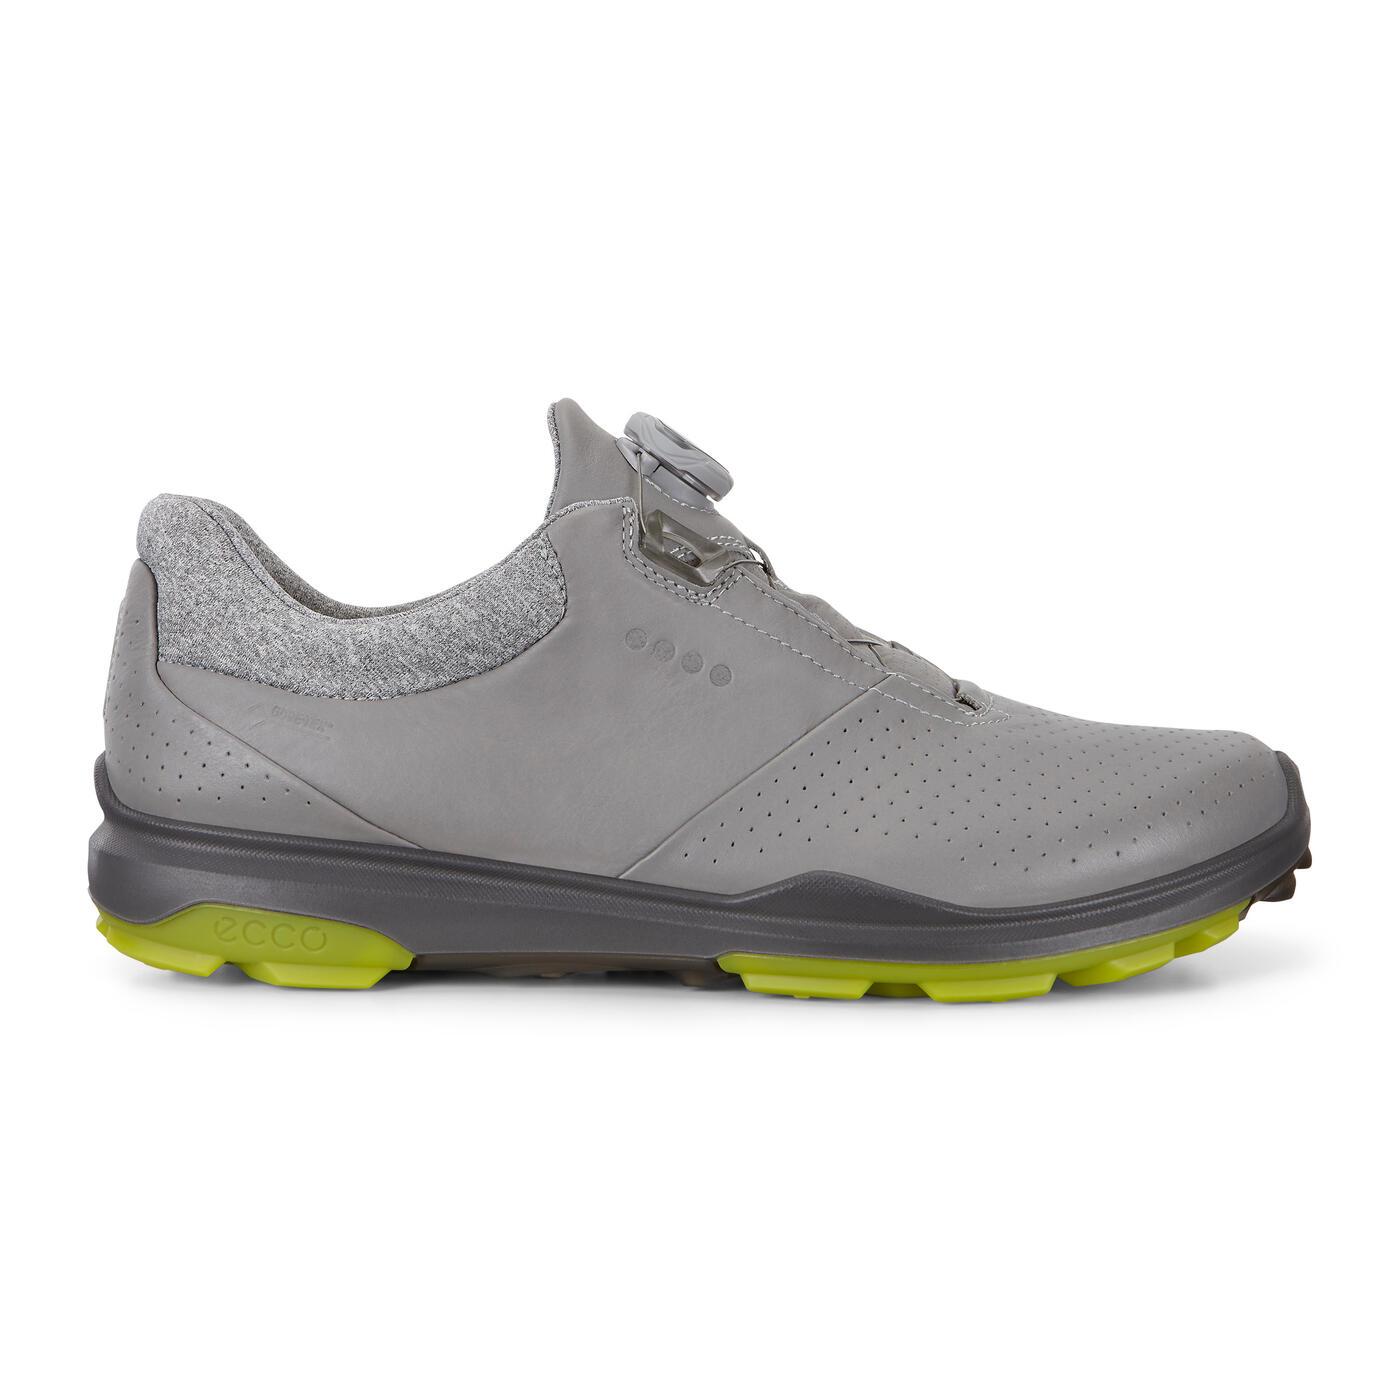 ECCO BIOM HYBRID 3 GTX BOA Men's Shoe